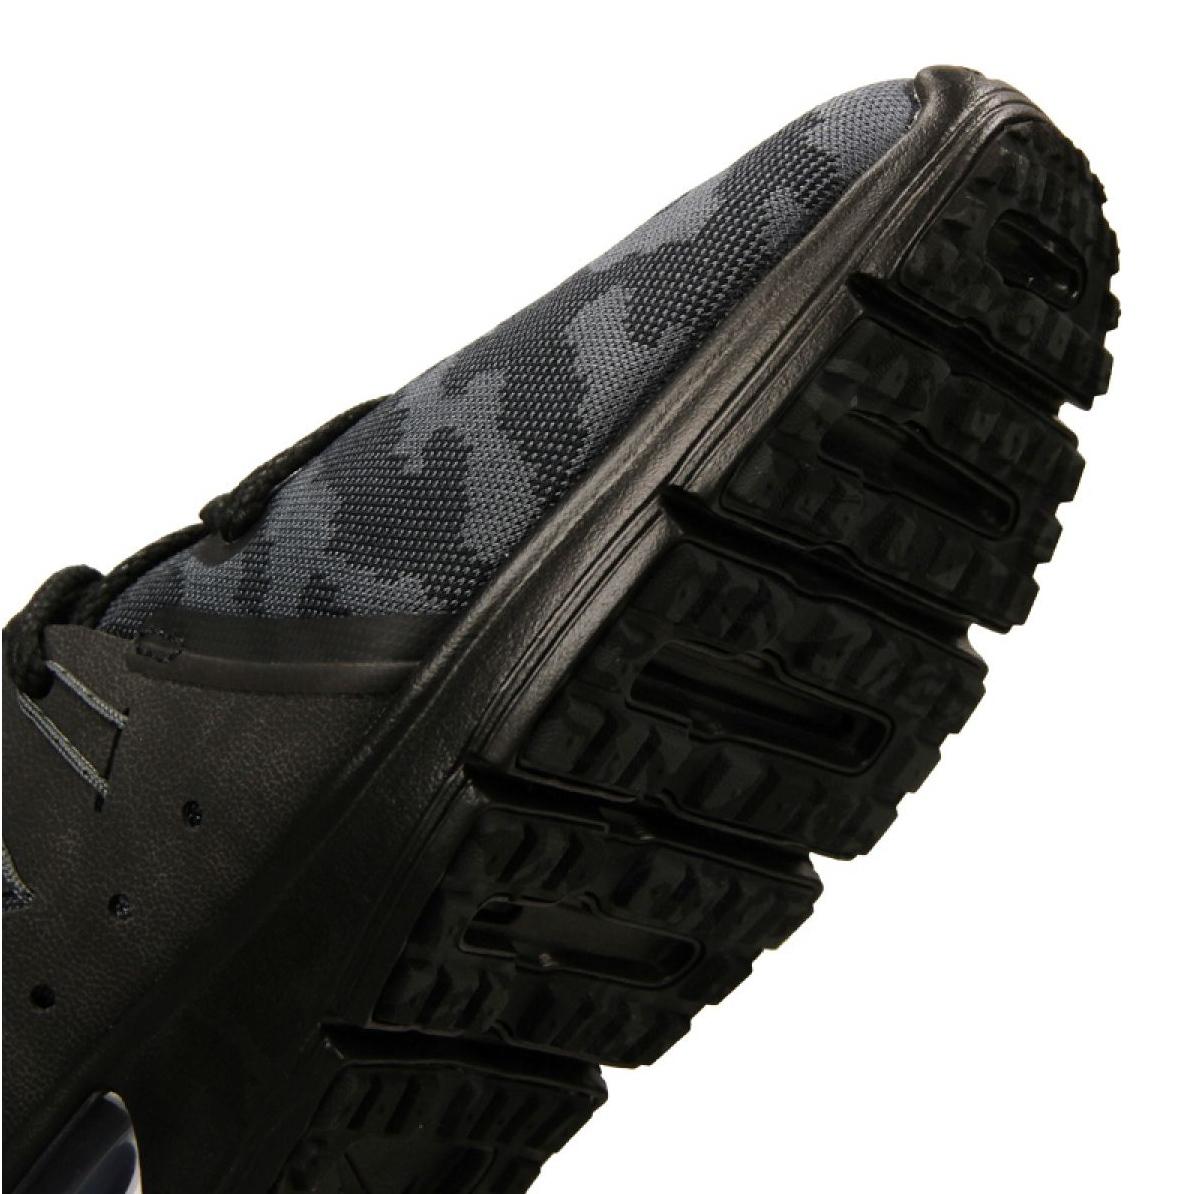 Nike Air Max Sequent 3 Férfi Futó cipő Cipő1.hu Férfi